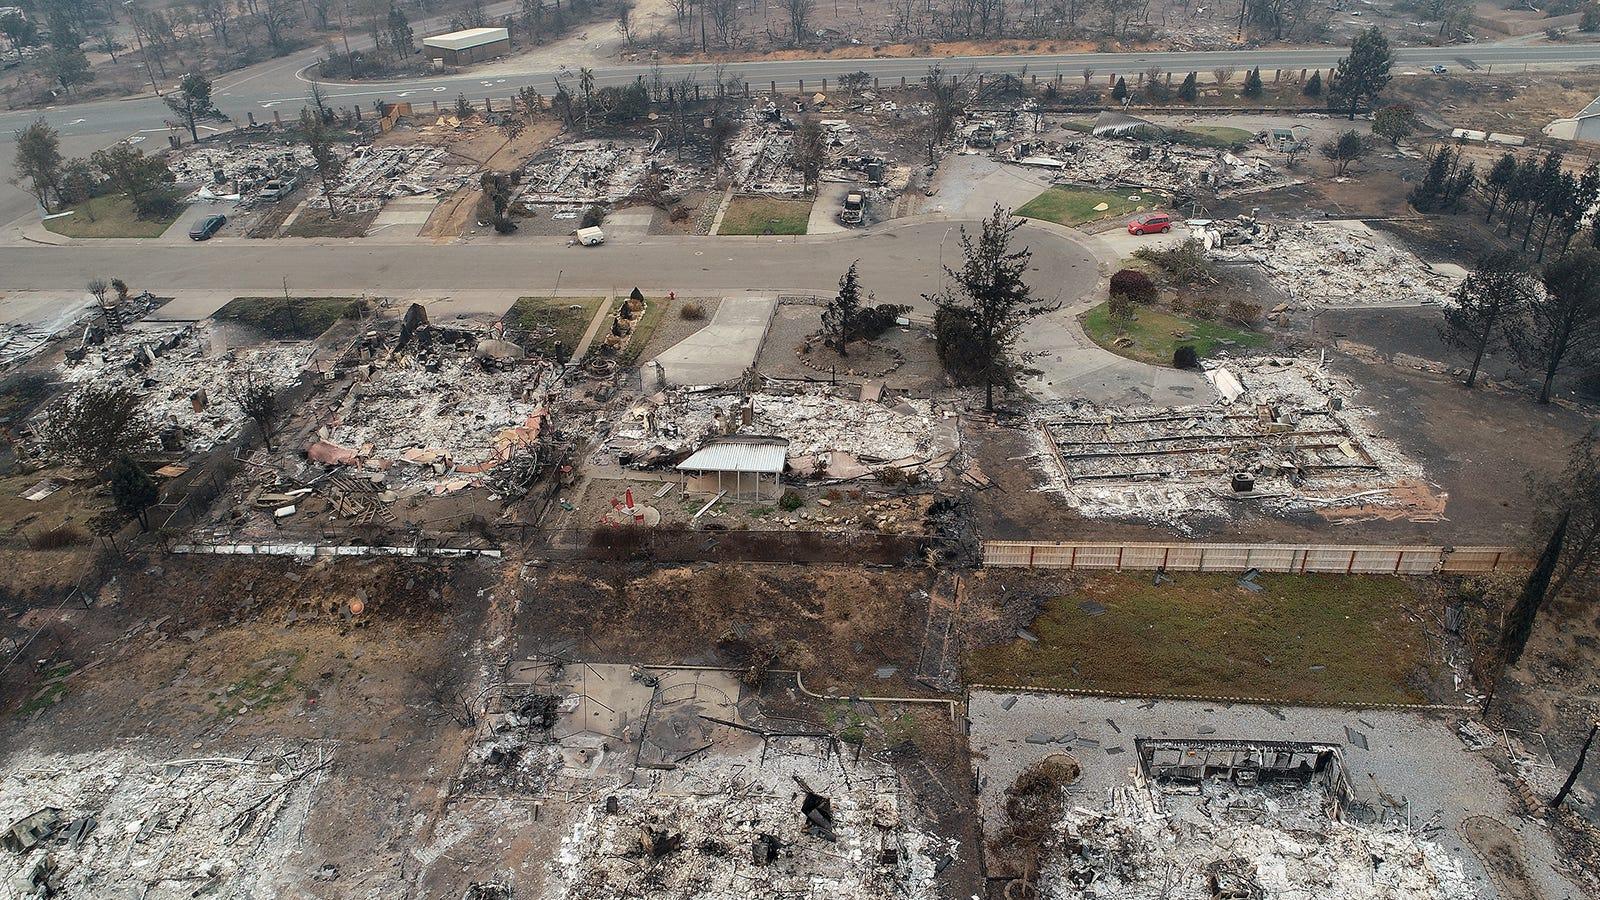 A view of the Lake Keswick Estates neighborhood on the northwest side of Redding, CA.